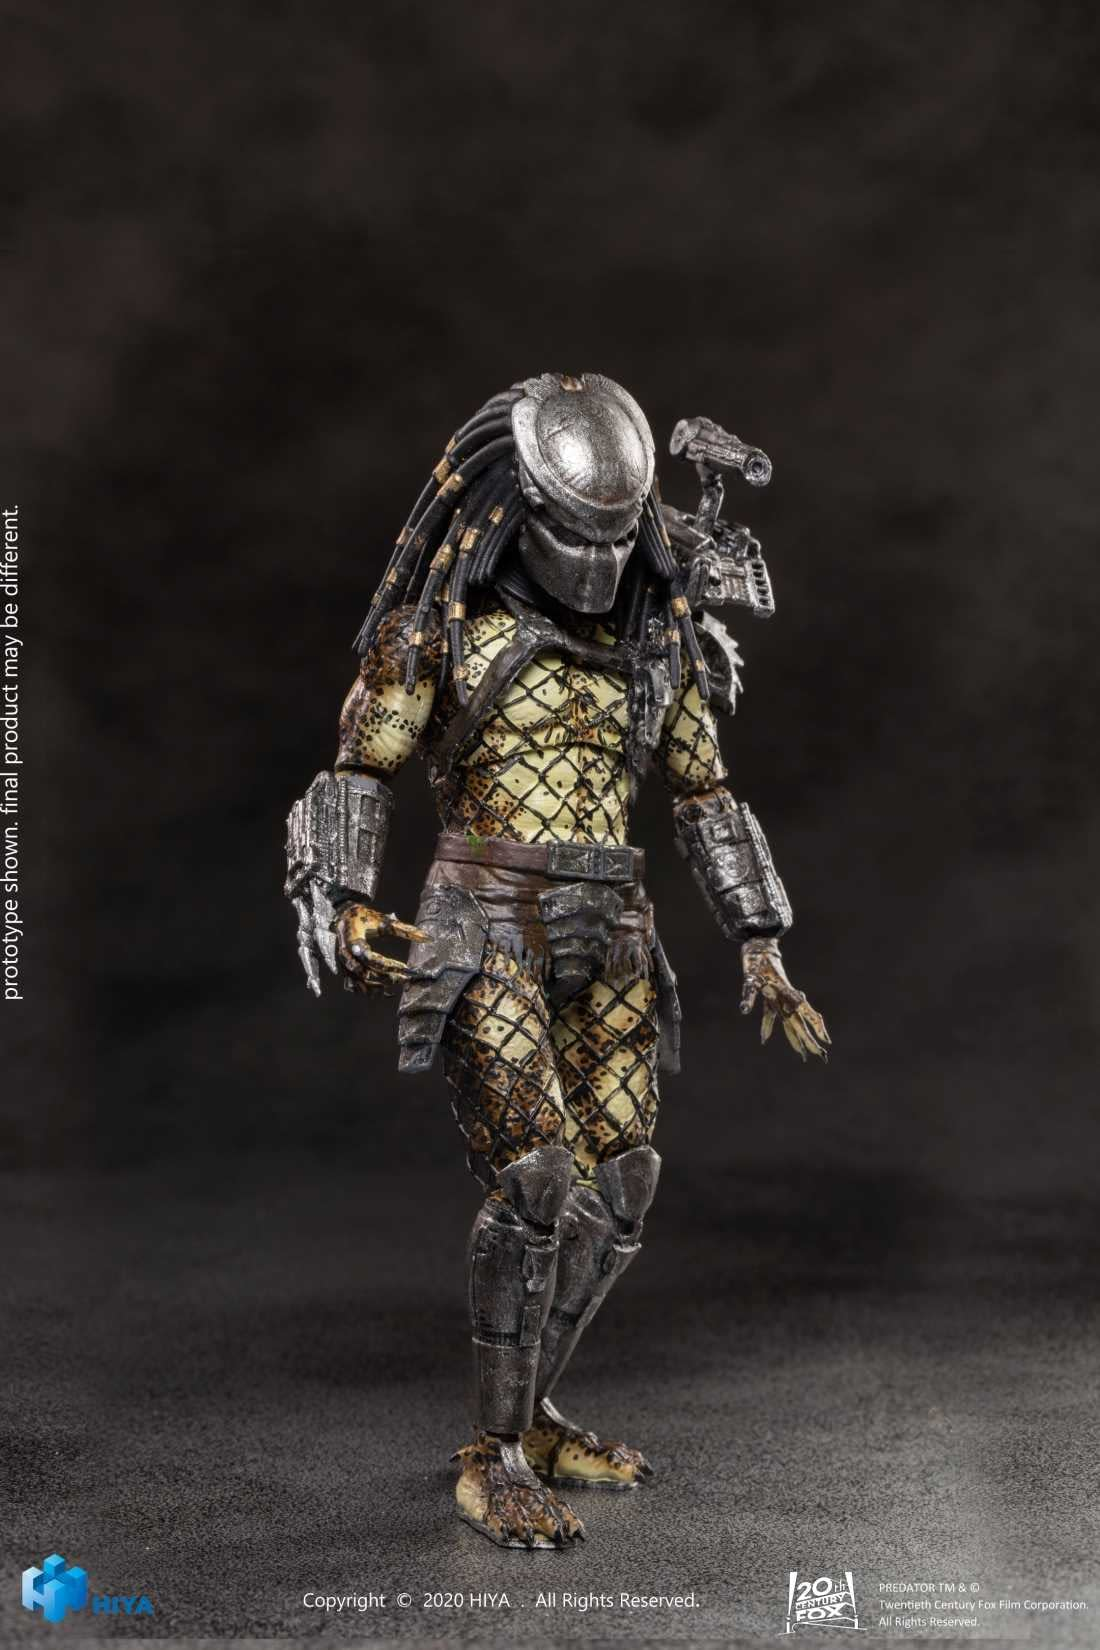 """RoboCop"" and ""Predators"" Get More Figures from Hiya Toys"